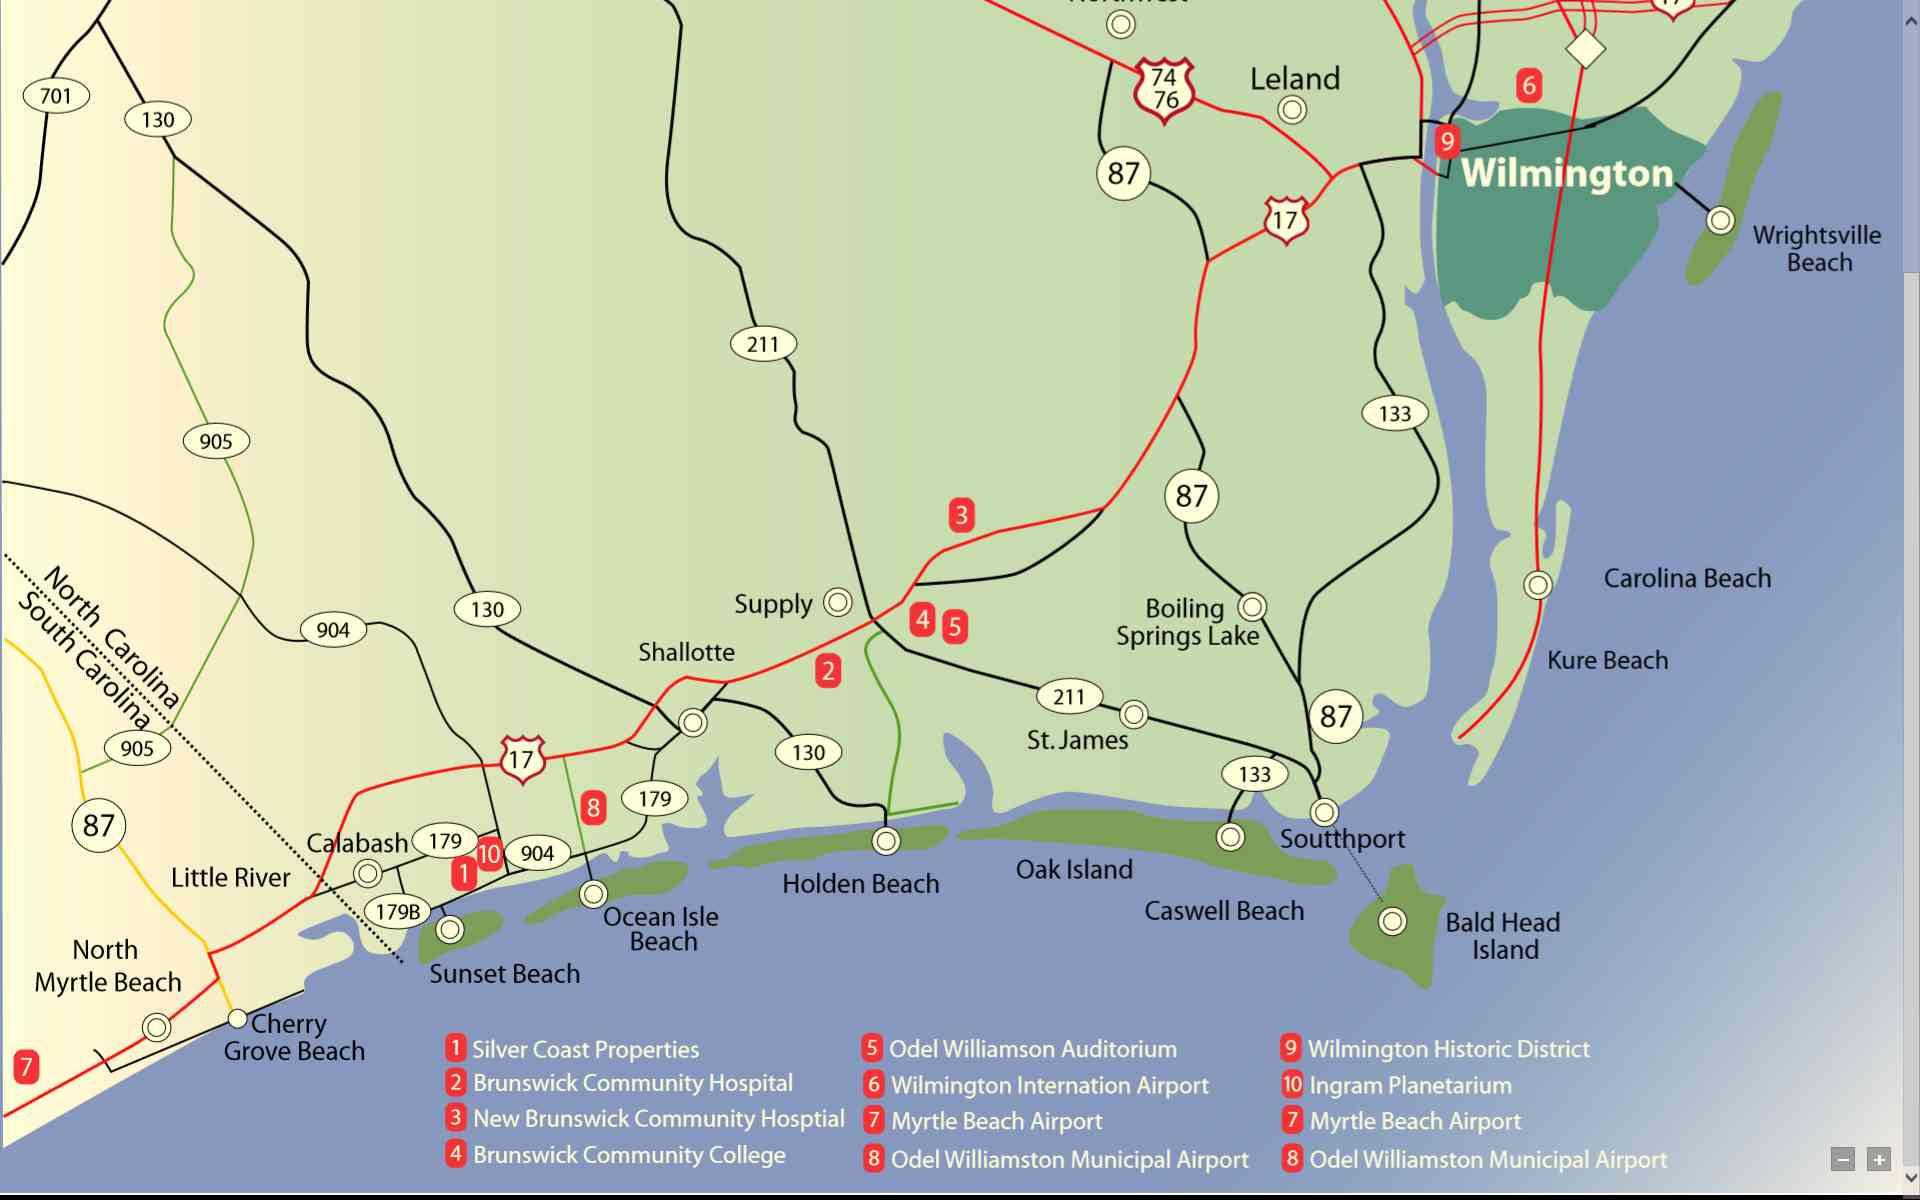 Area map of the brunswick NC coastal Carolina area including